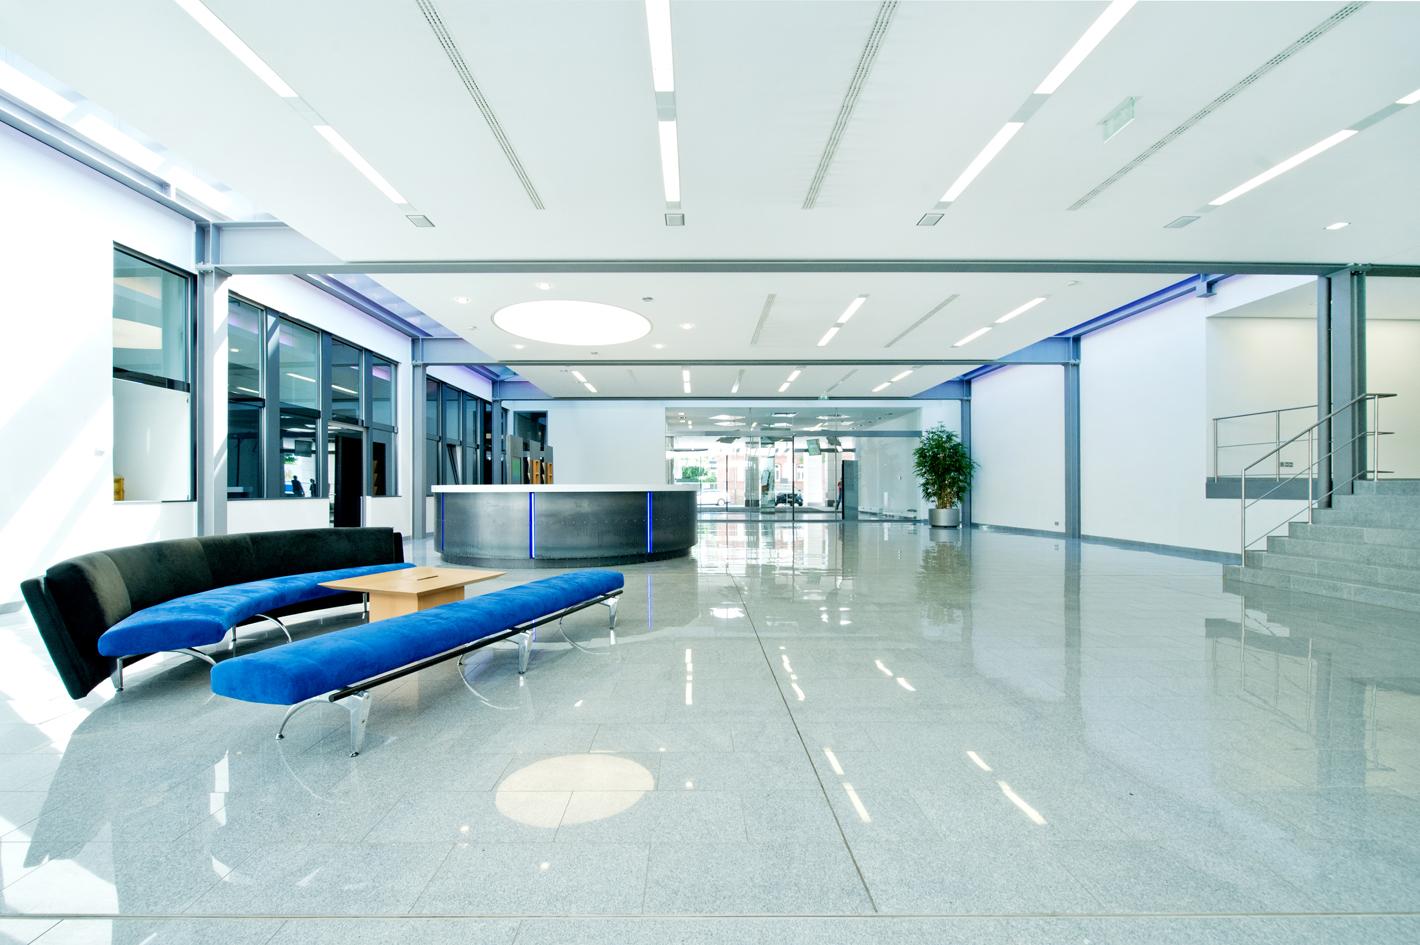 mtc meeting training center saarbr cken landeshauptstadt. Black Bedroom Furniture Sets. Home Design Ideas